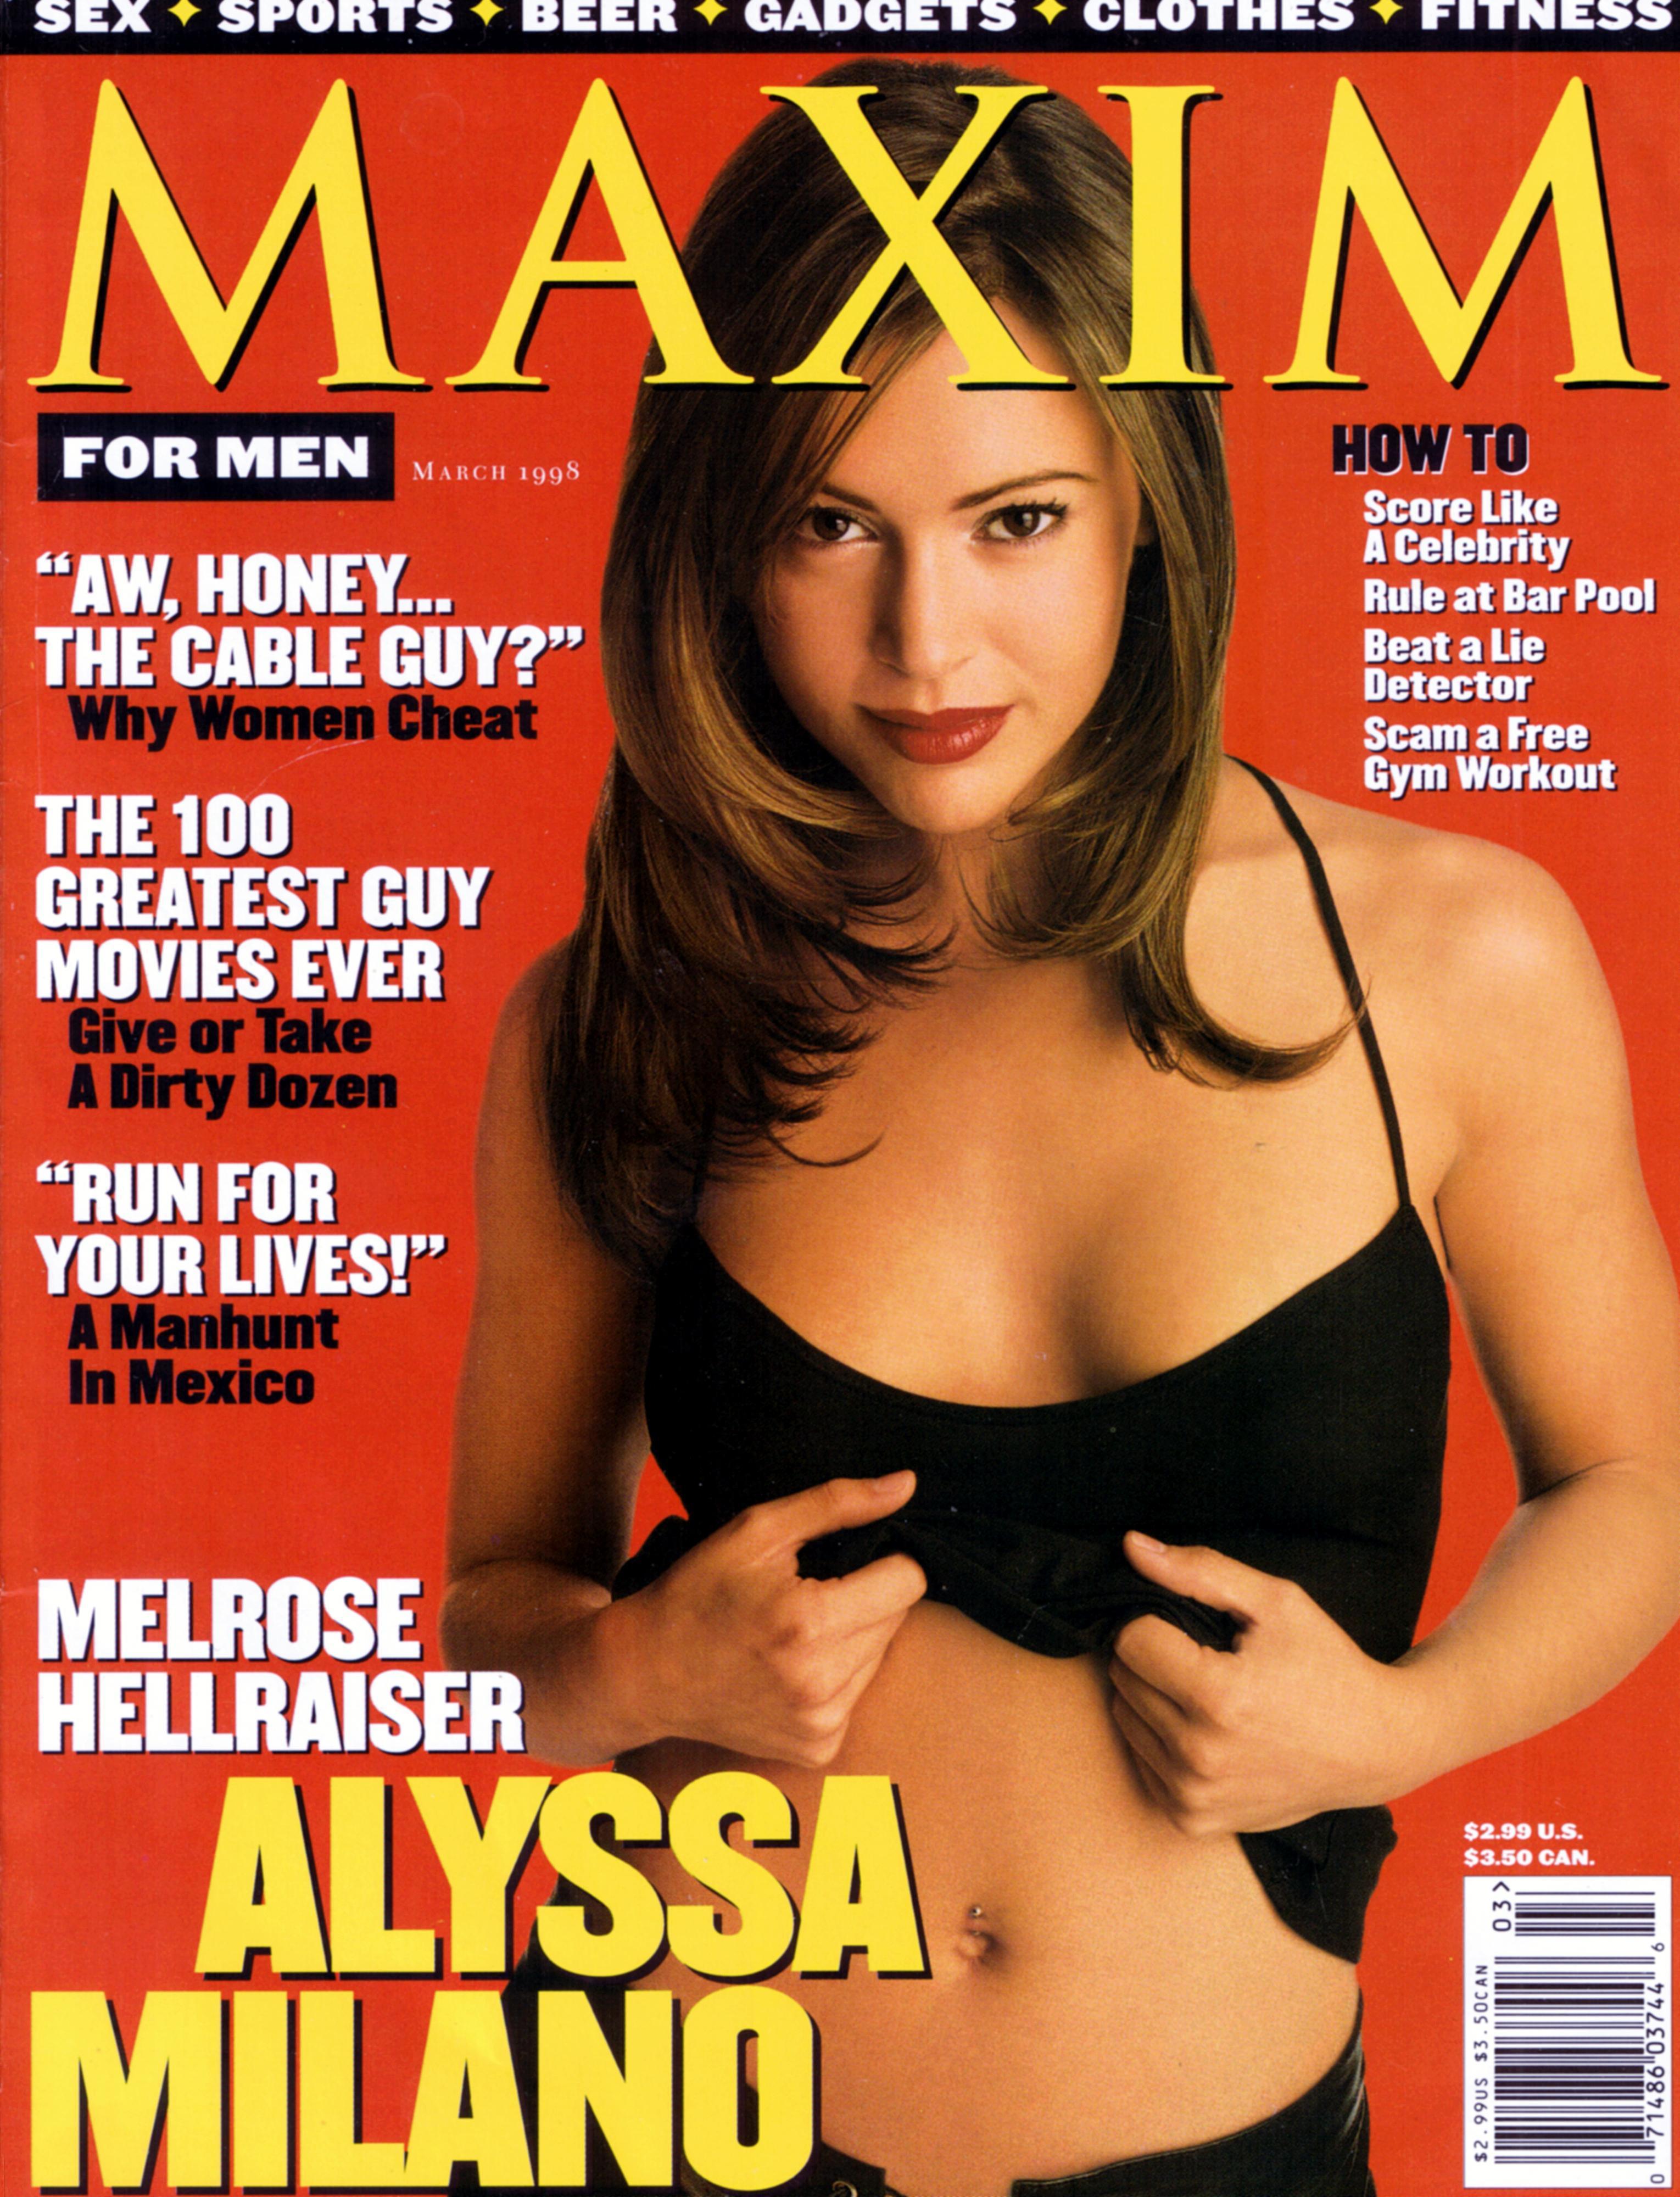 96199_Alyssa_Milano.Maxim_Magazine.March_1998.Scanned_by_KROQJOCK.UHQ1_122_1193lo.jpg